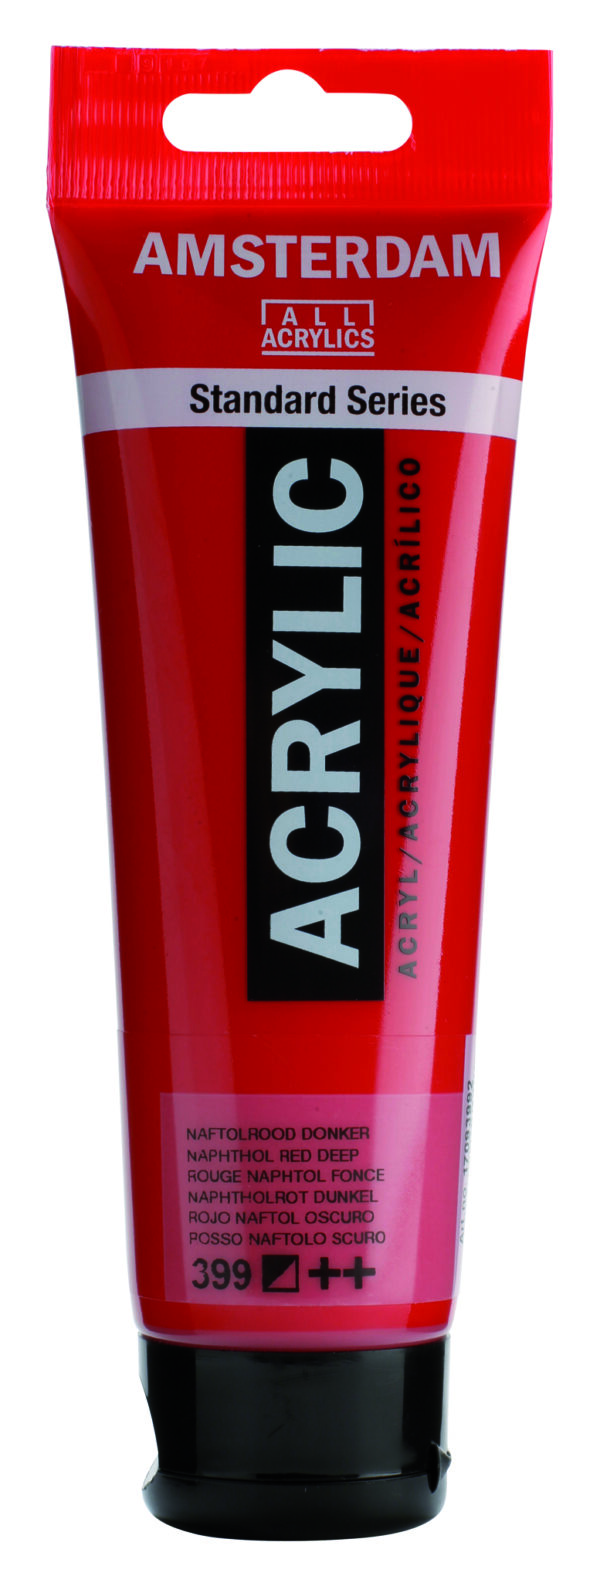 Ams std 399 Naphtol red Deep - 120 ml